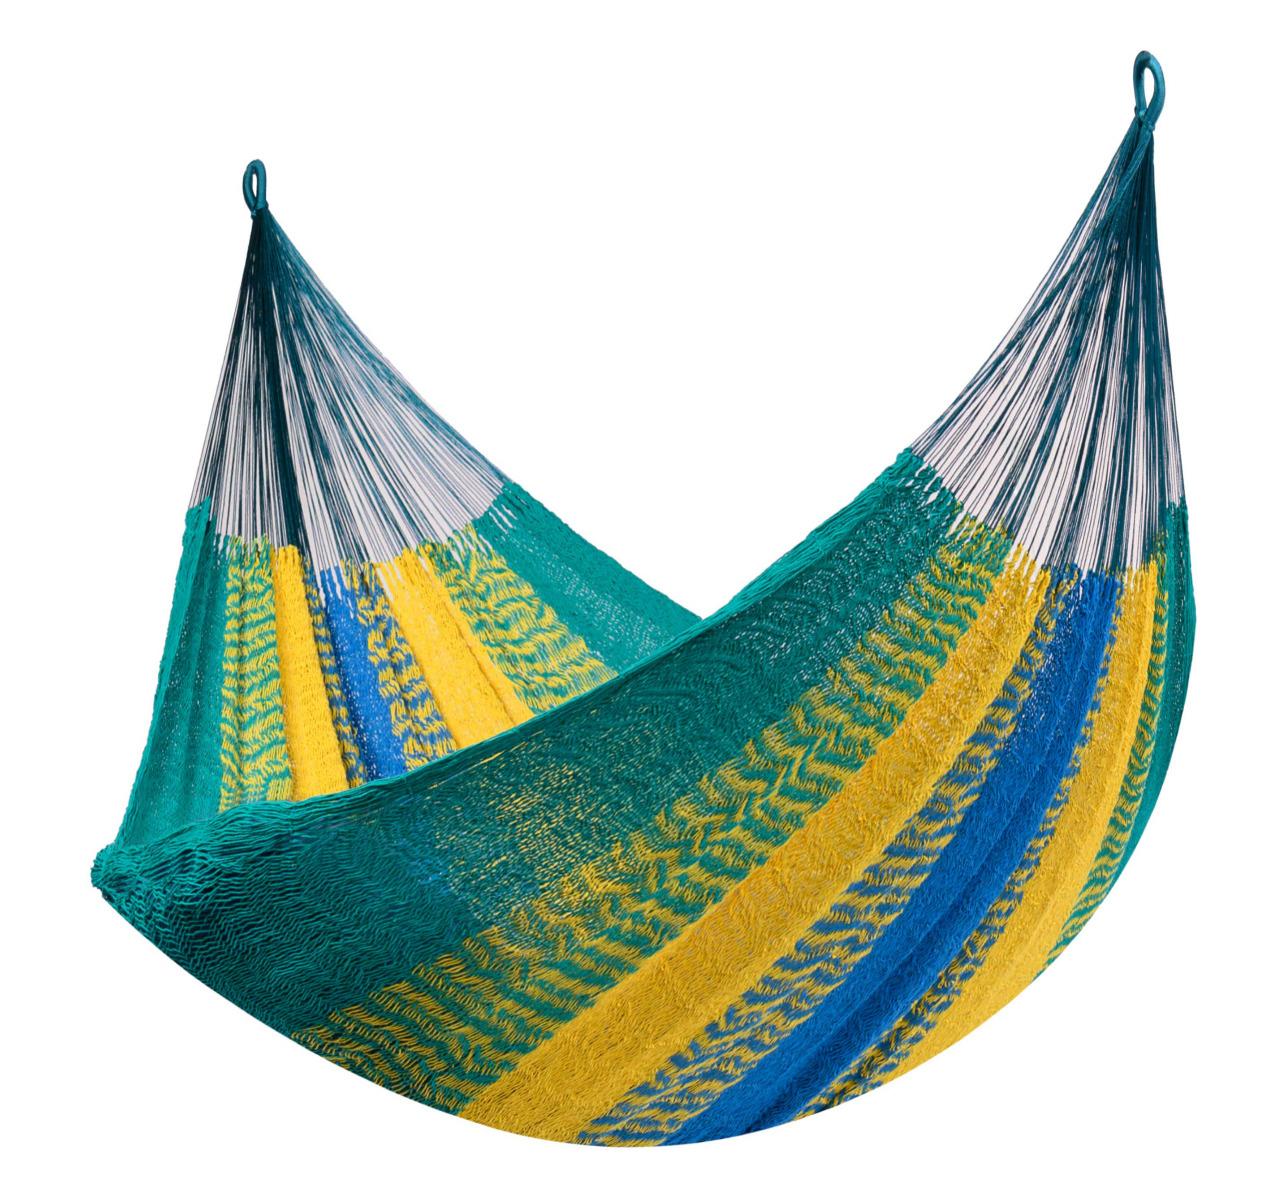 Hangmat 'Mexico' Tropical - Tropilex �